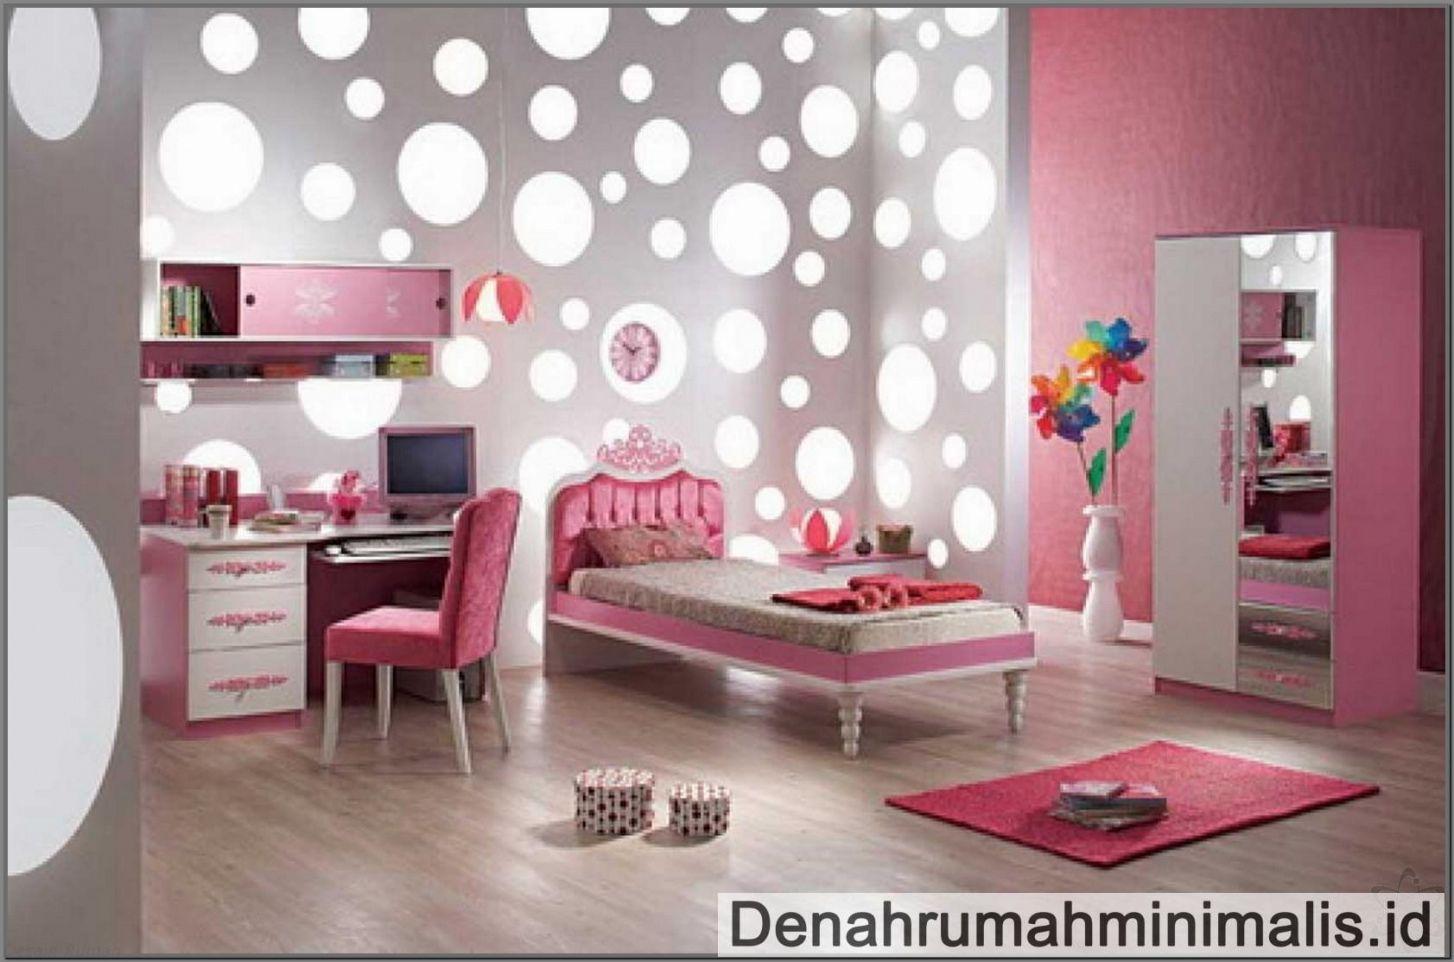 kumpulan desain kamar tidur minimalis anak muda | homkonsep